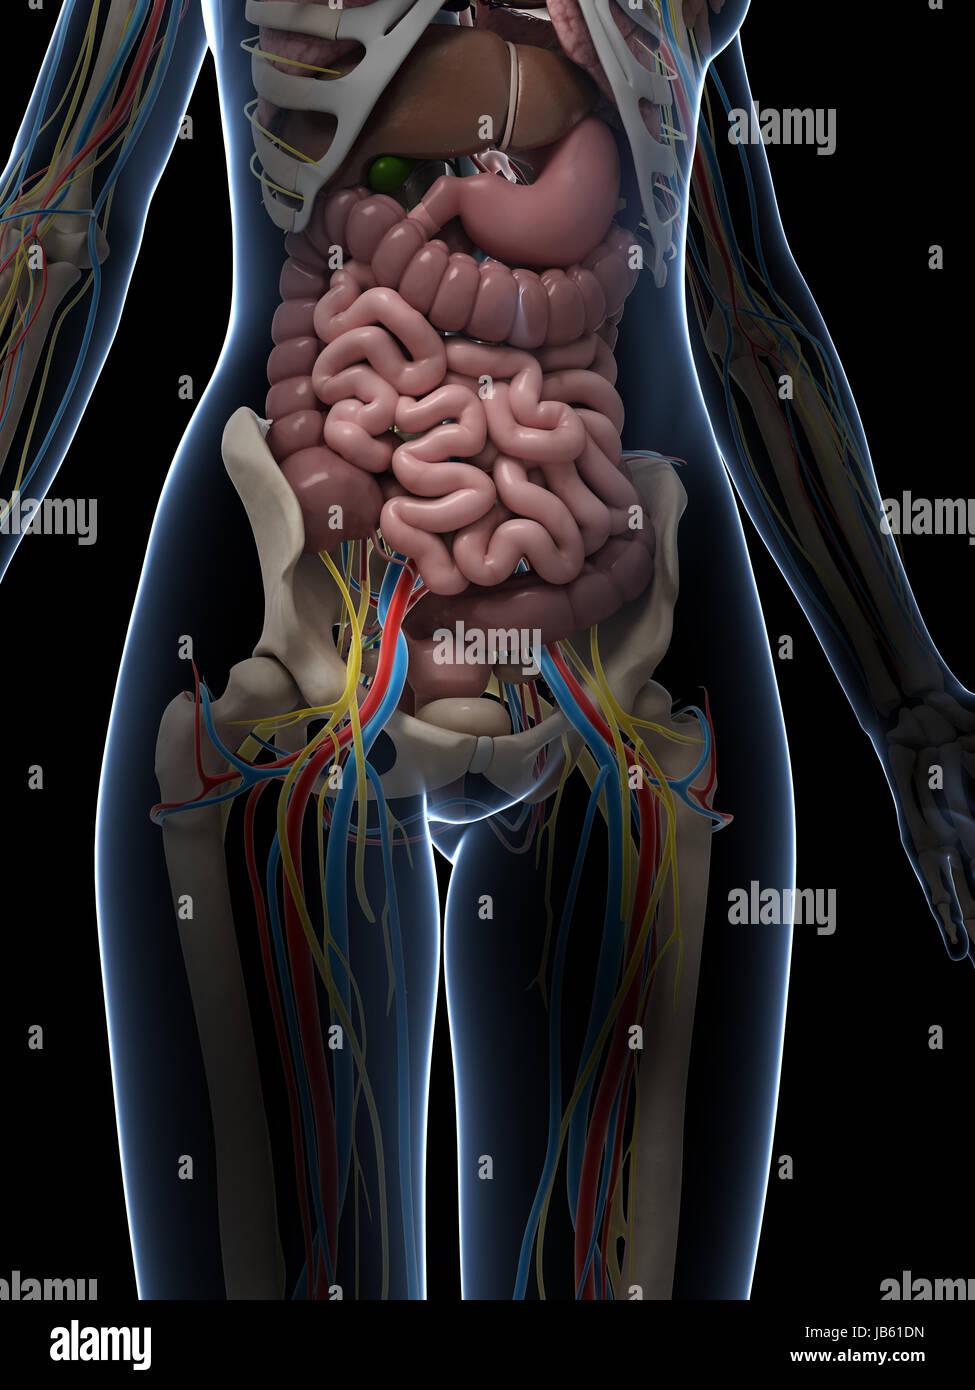 Female Anatomy Diagram Stock Photos  U0026 Female Anatomy